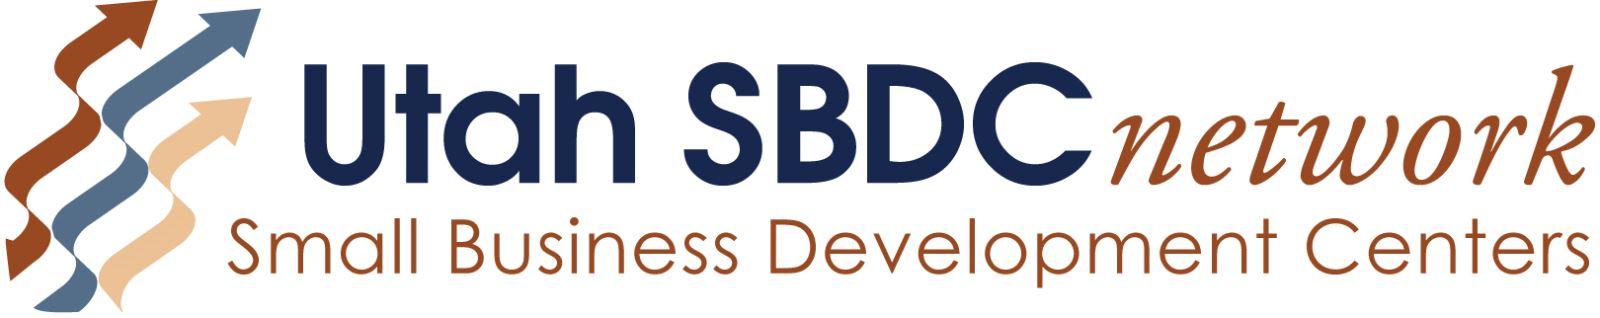 SBDC Network Small Business Development Center